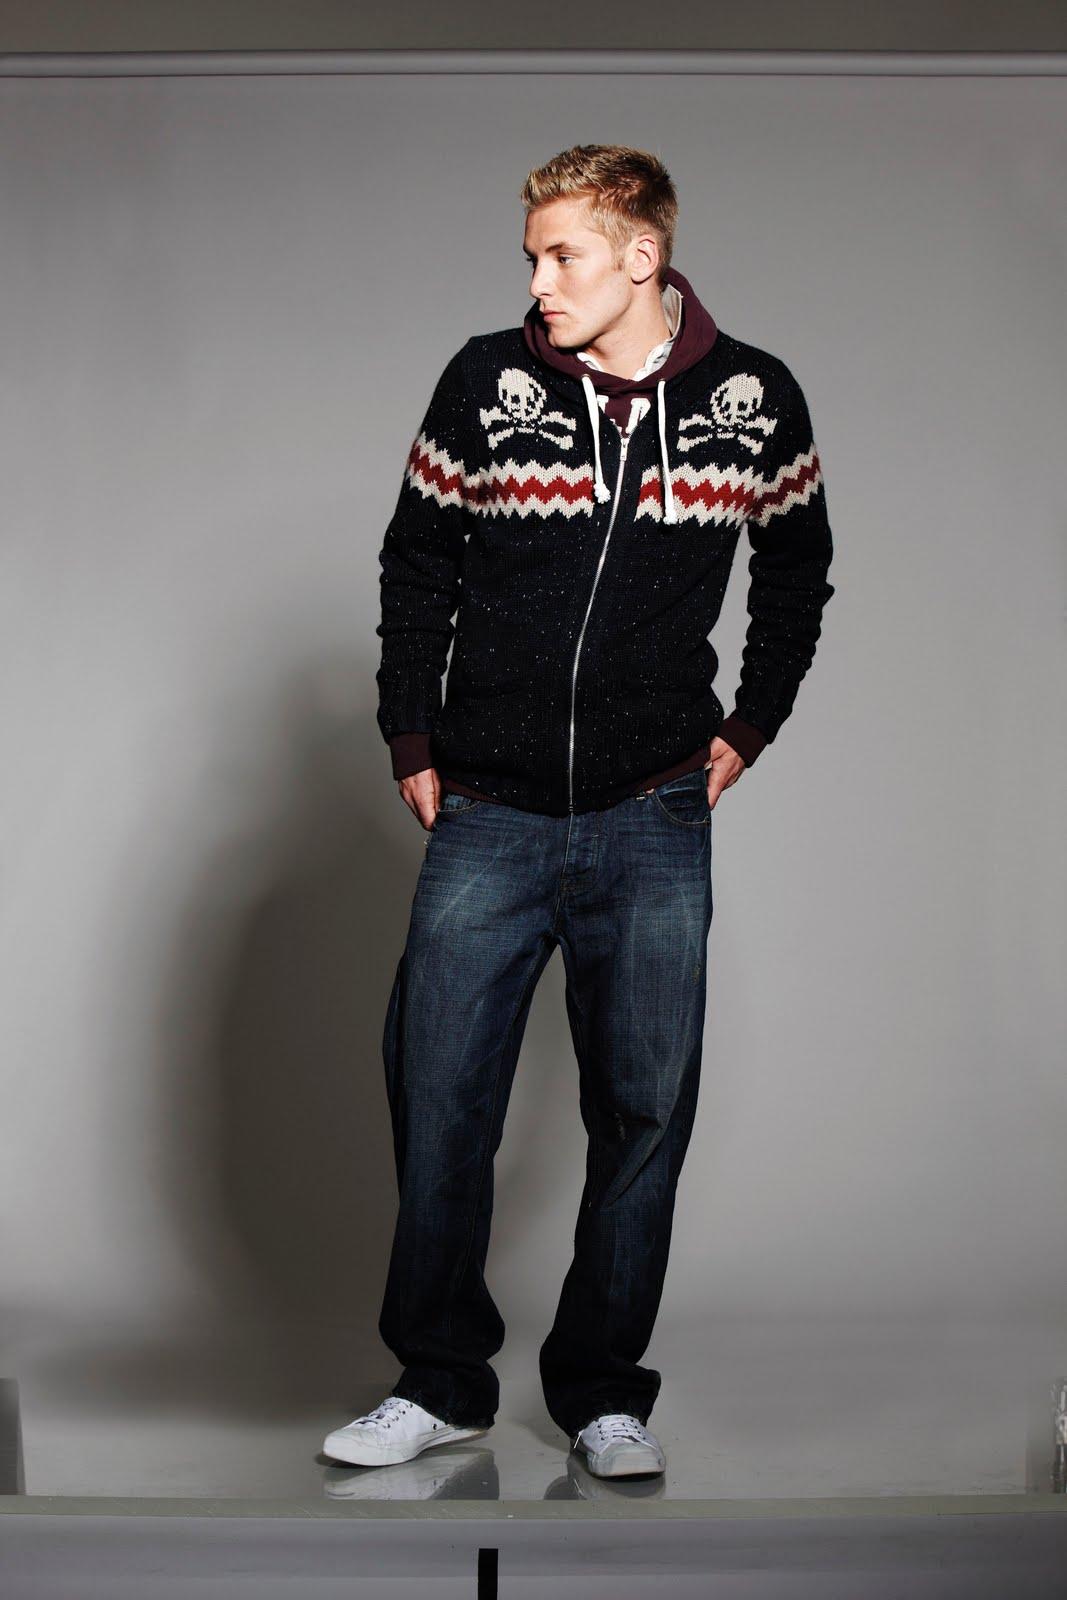 men 39 s styling matalan autumn winter 2010 menswear collection. Black Bedroom Furniture Sets. Home Design Ideas